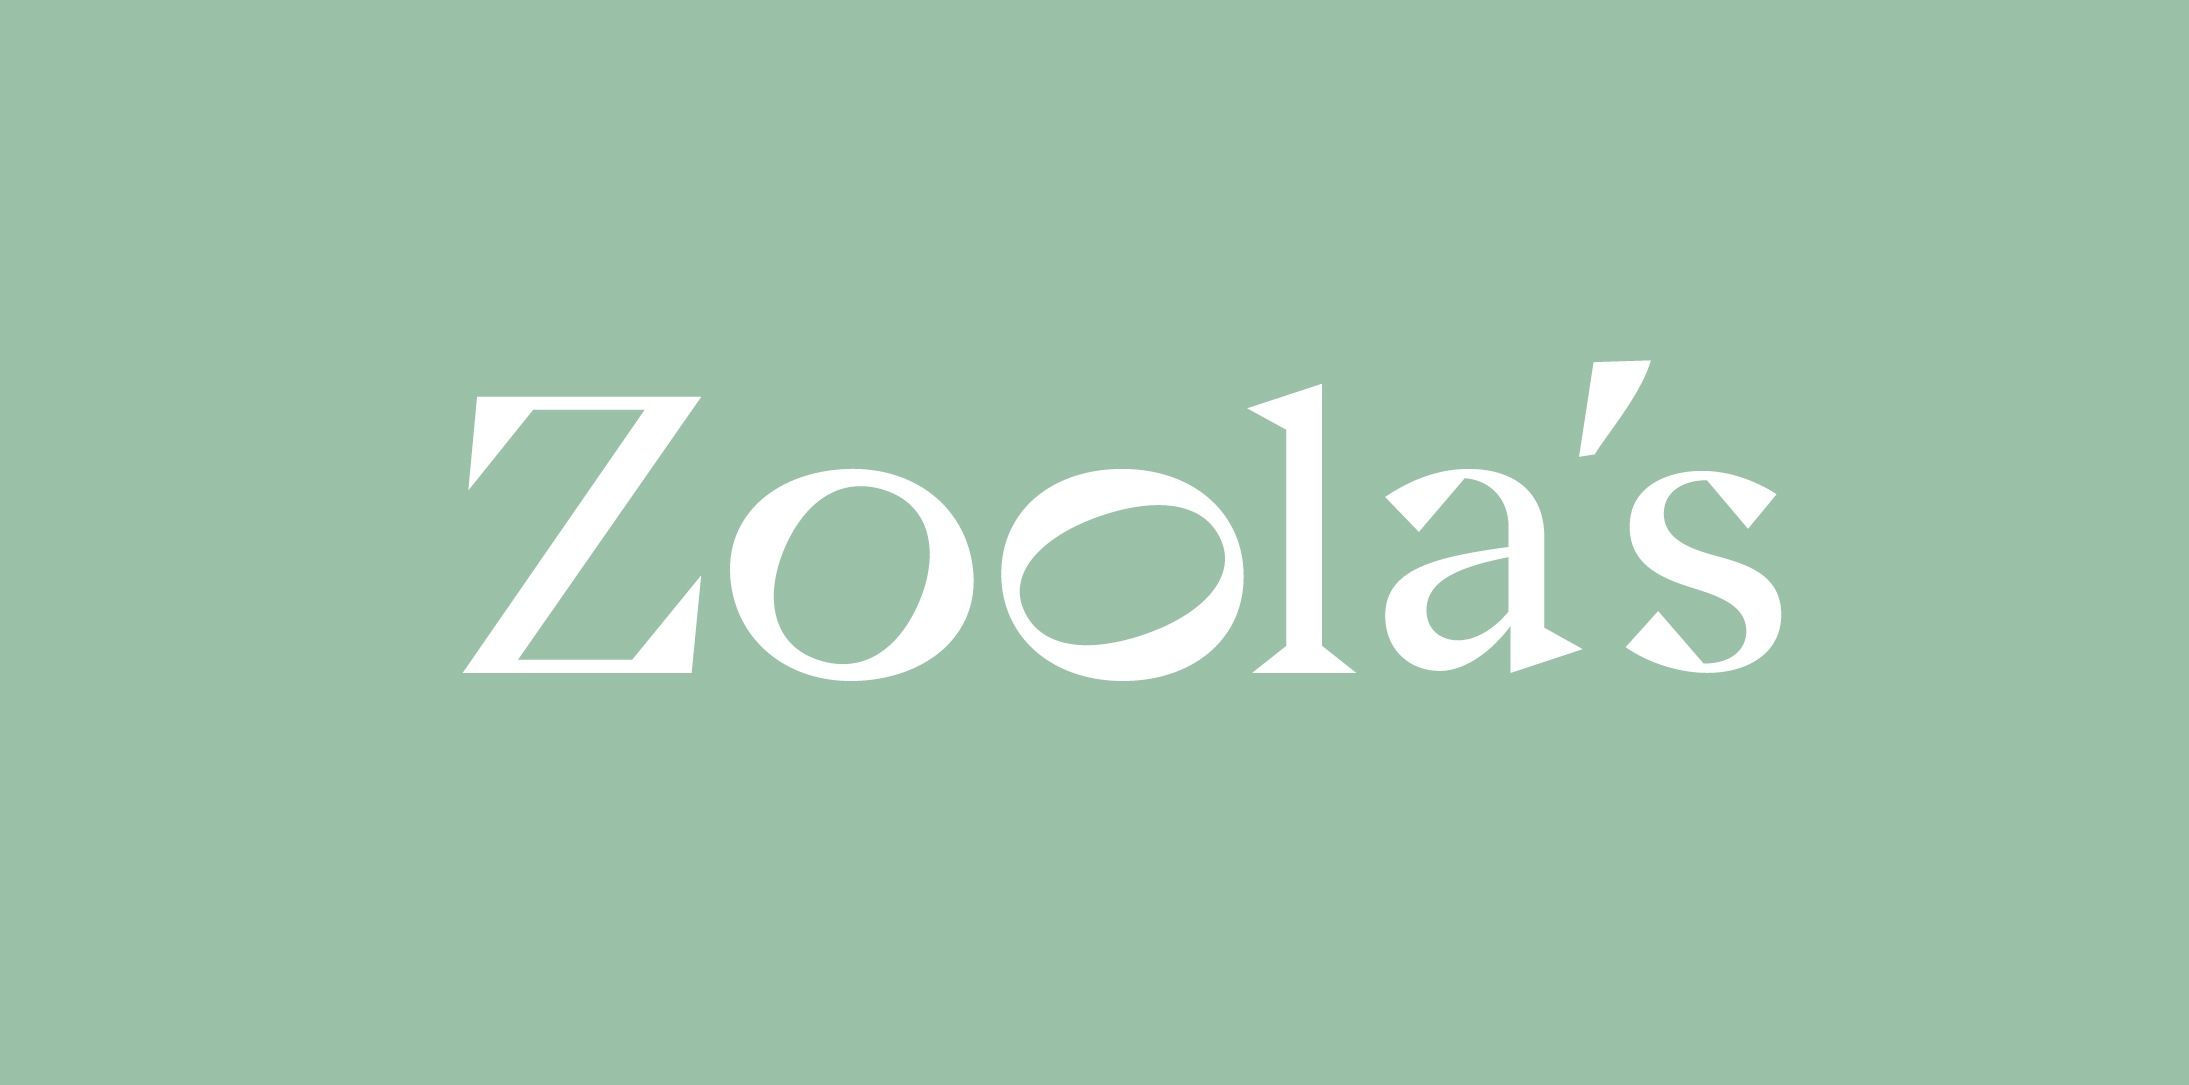 Zoola's